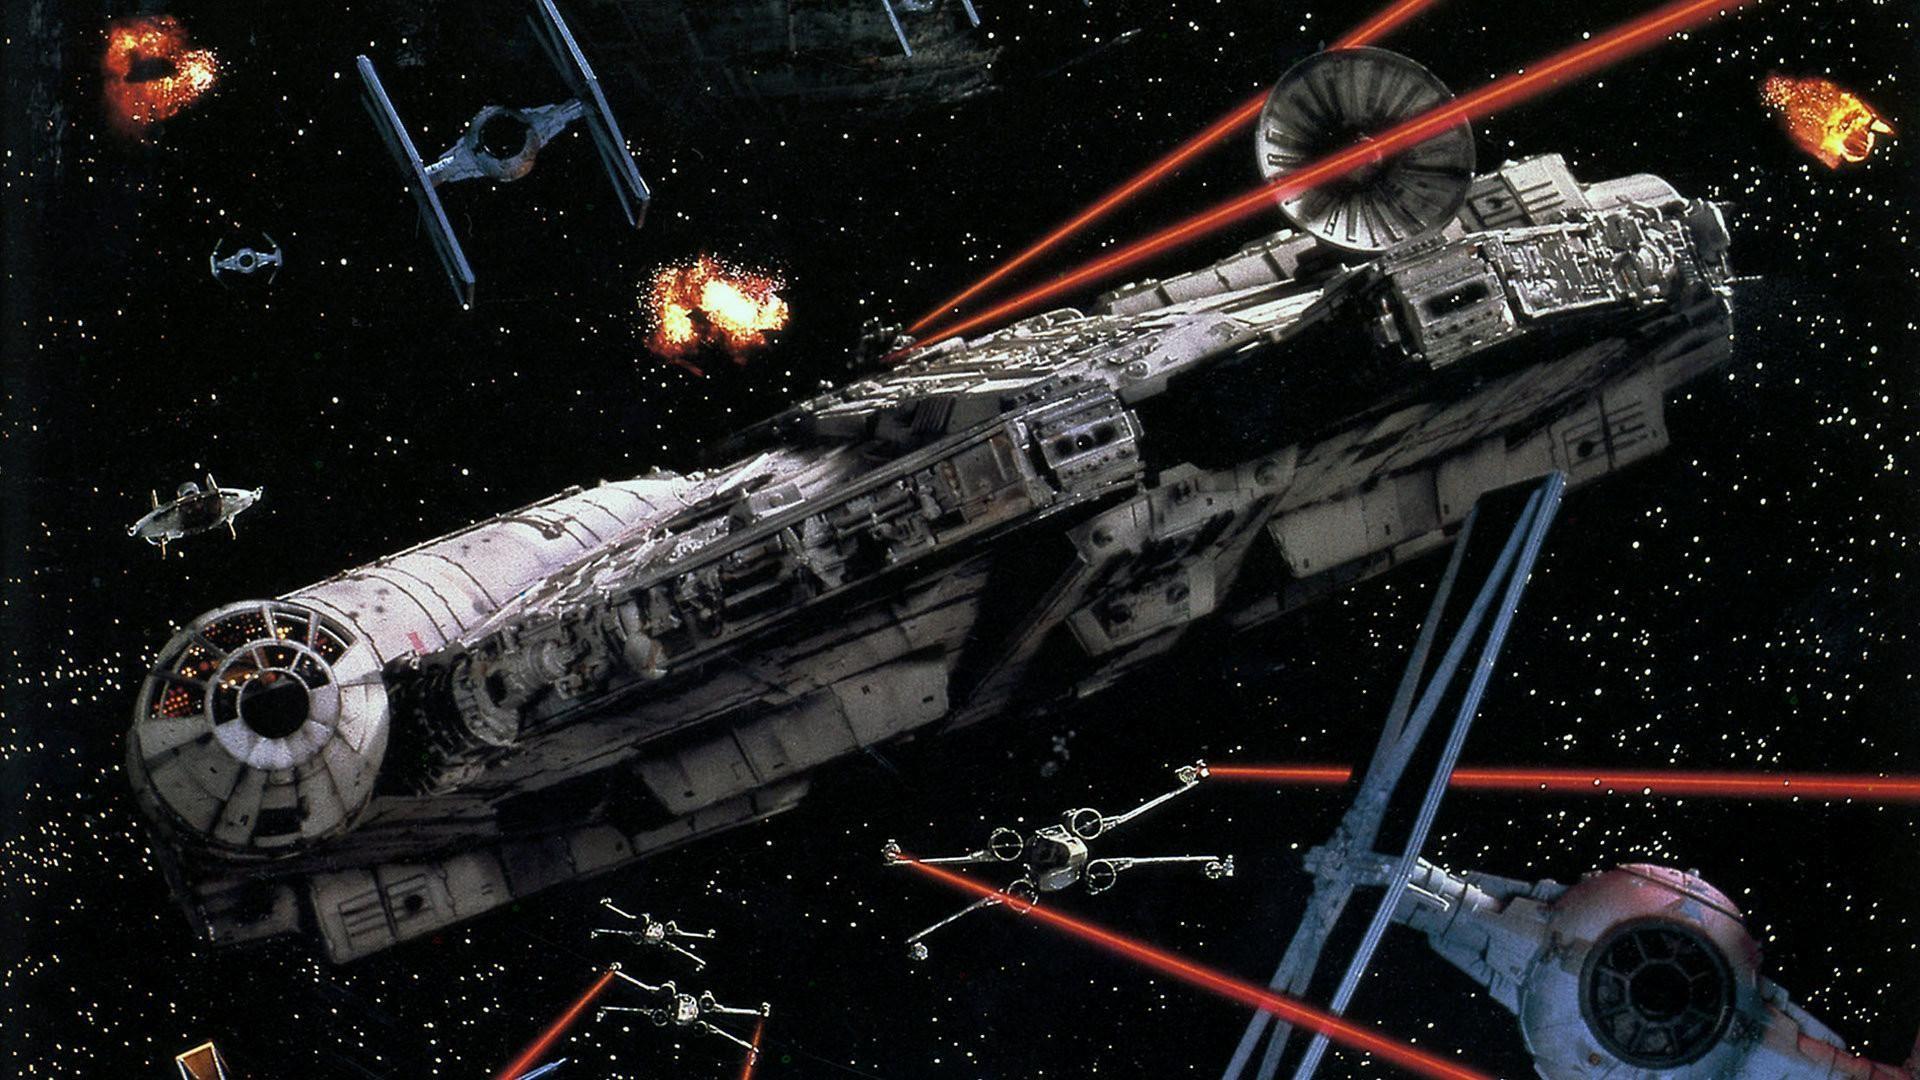 wallpaper.wiki-Epic-Star-Wars-Wallpapers-HD-Free-